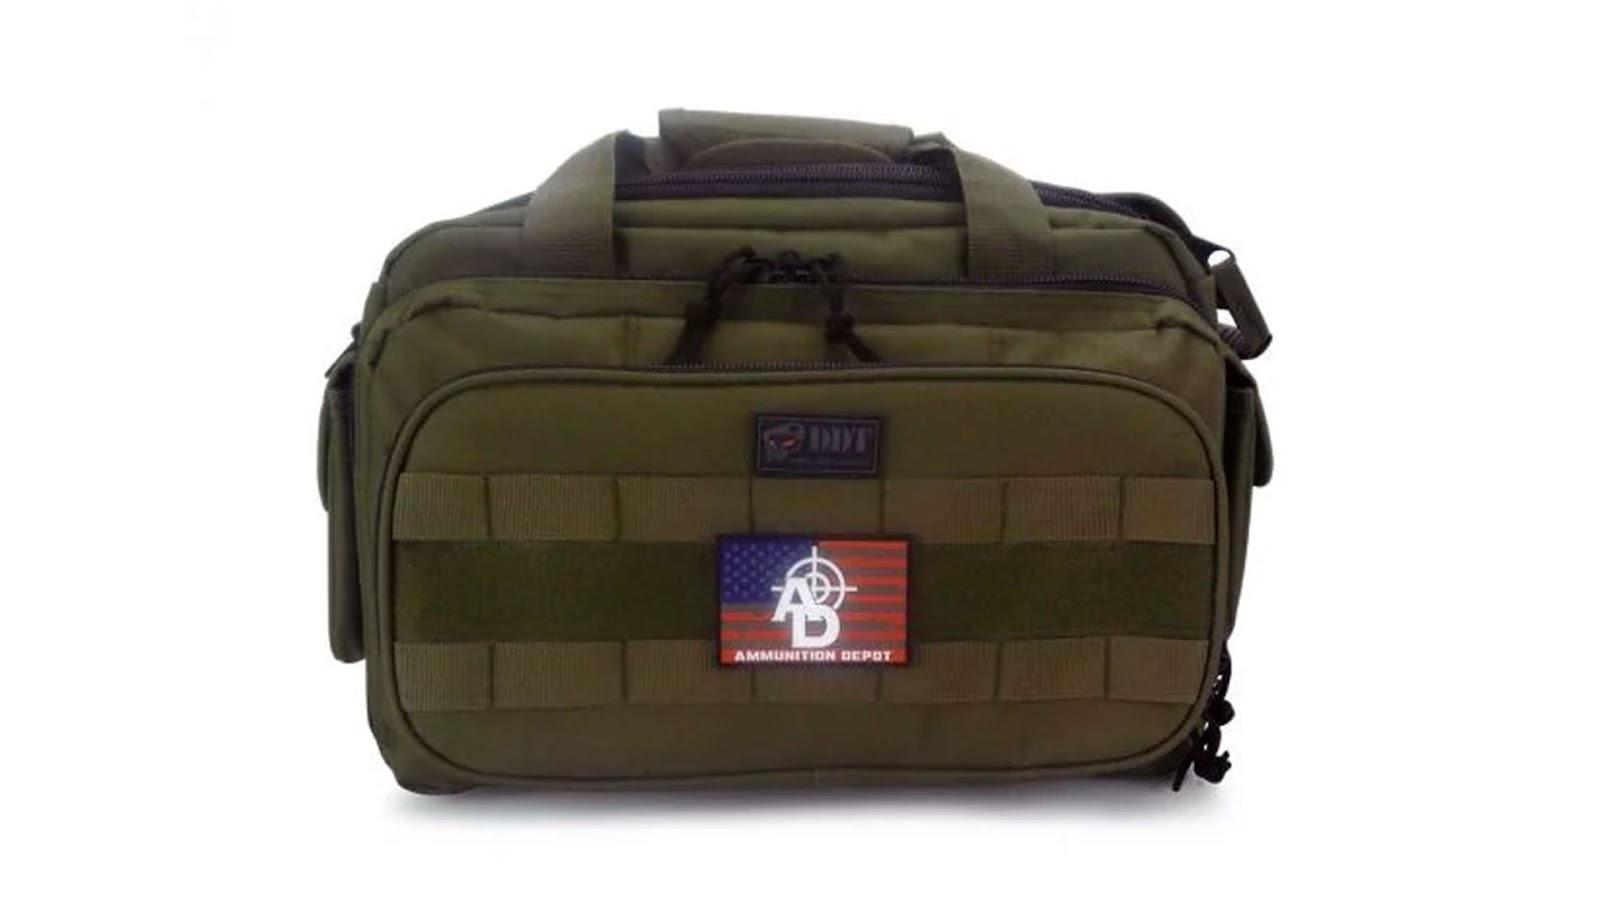 DDT Ranger bag with Ammunition Depot Patch